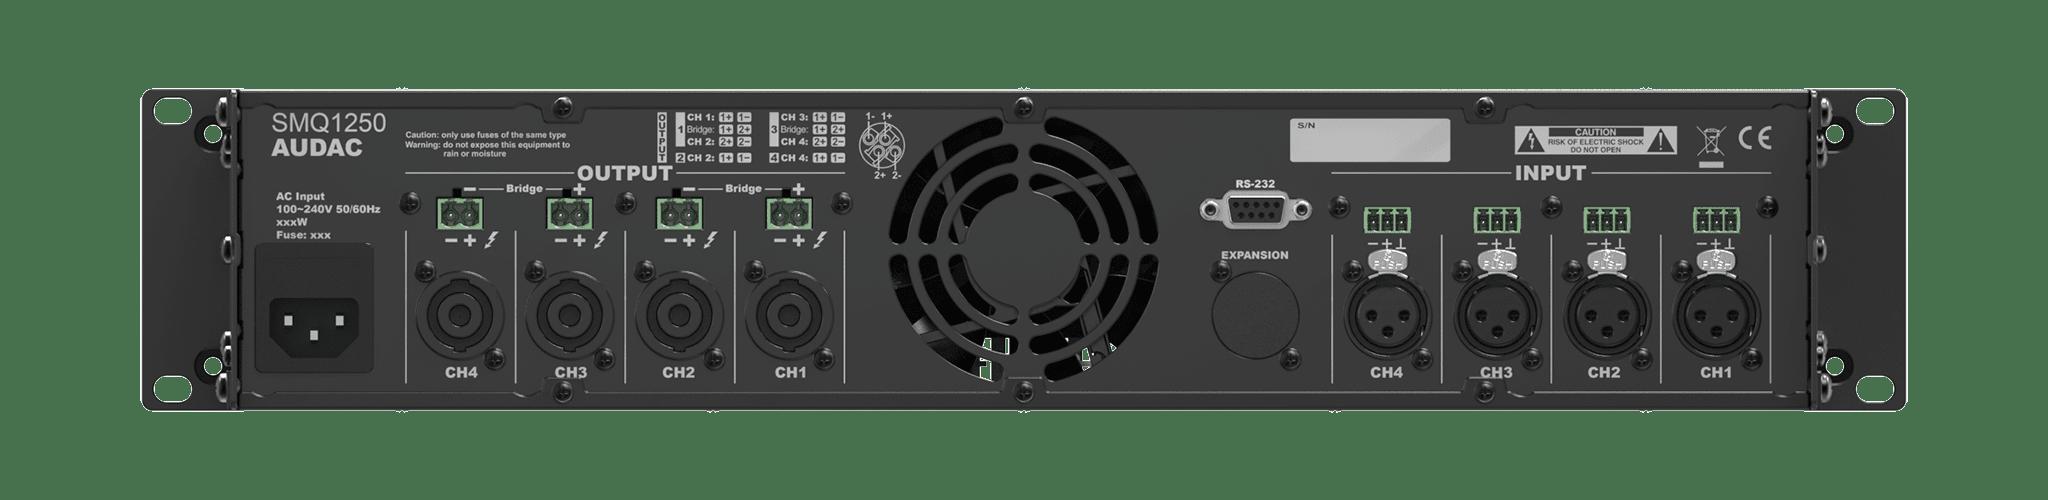 SMQ1250 - WaveDynamics™ quad-channel power amplifier 4 x 1250W